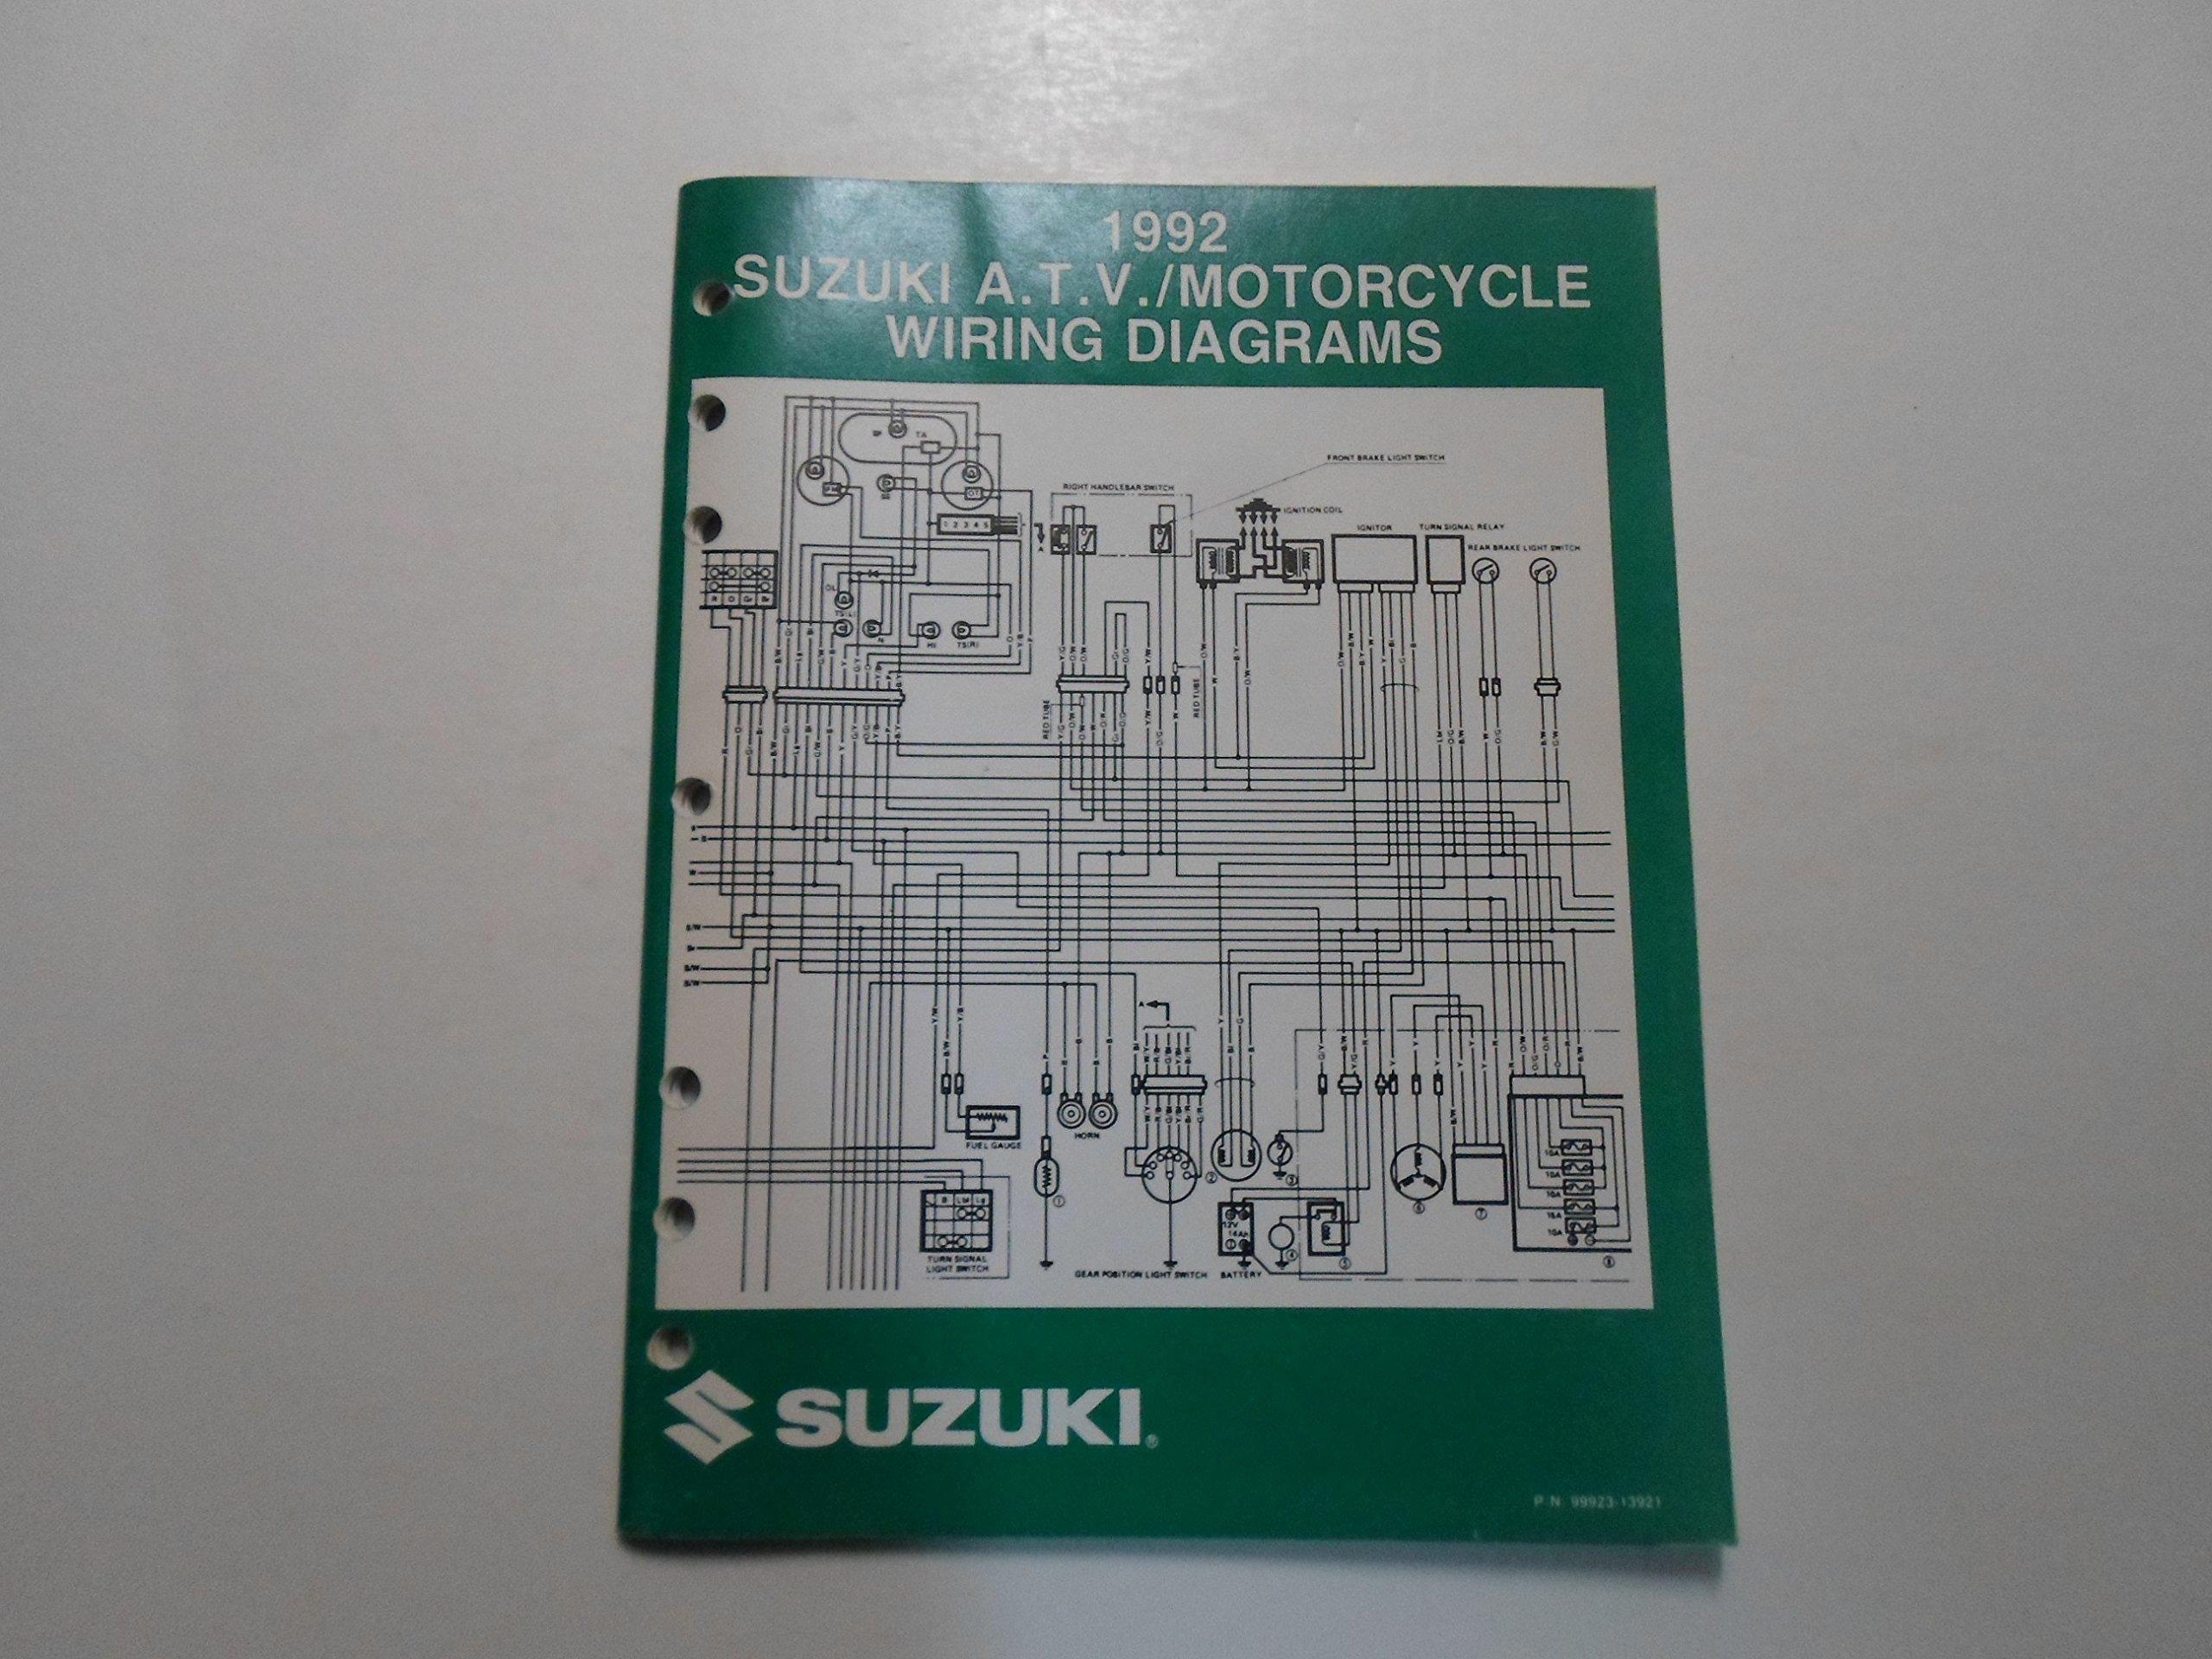 zb_2306] clifford alarm wiring diagrams quotes  dext skat tron sieg hapolo mohammedshrine librar wiring 101